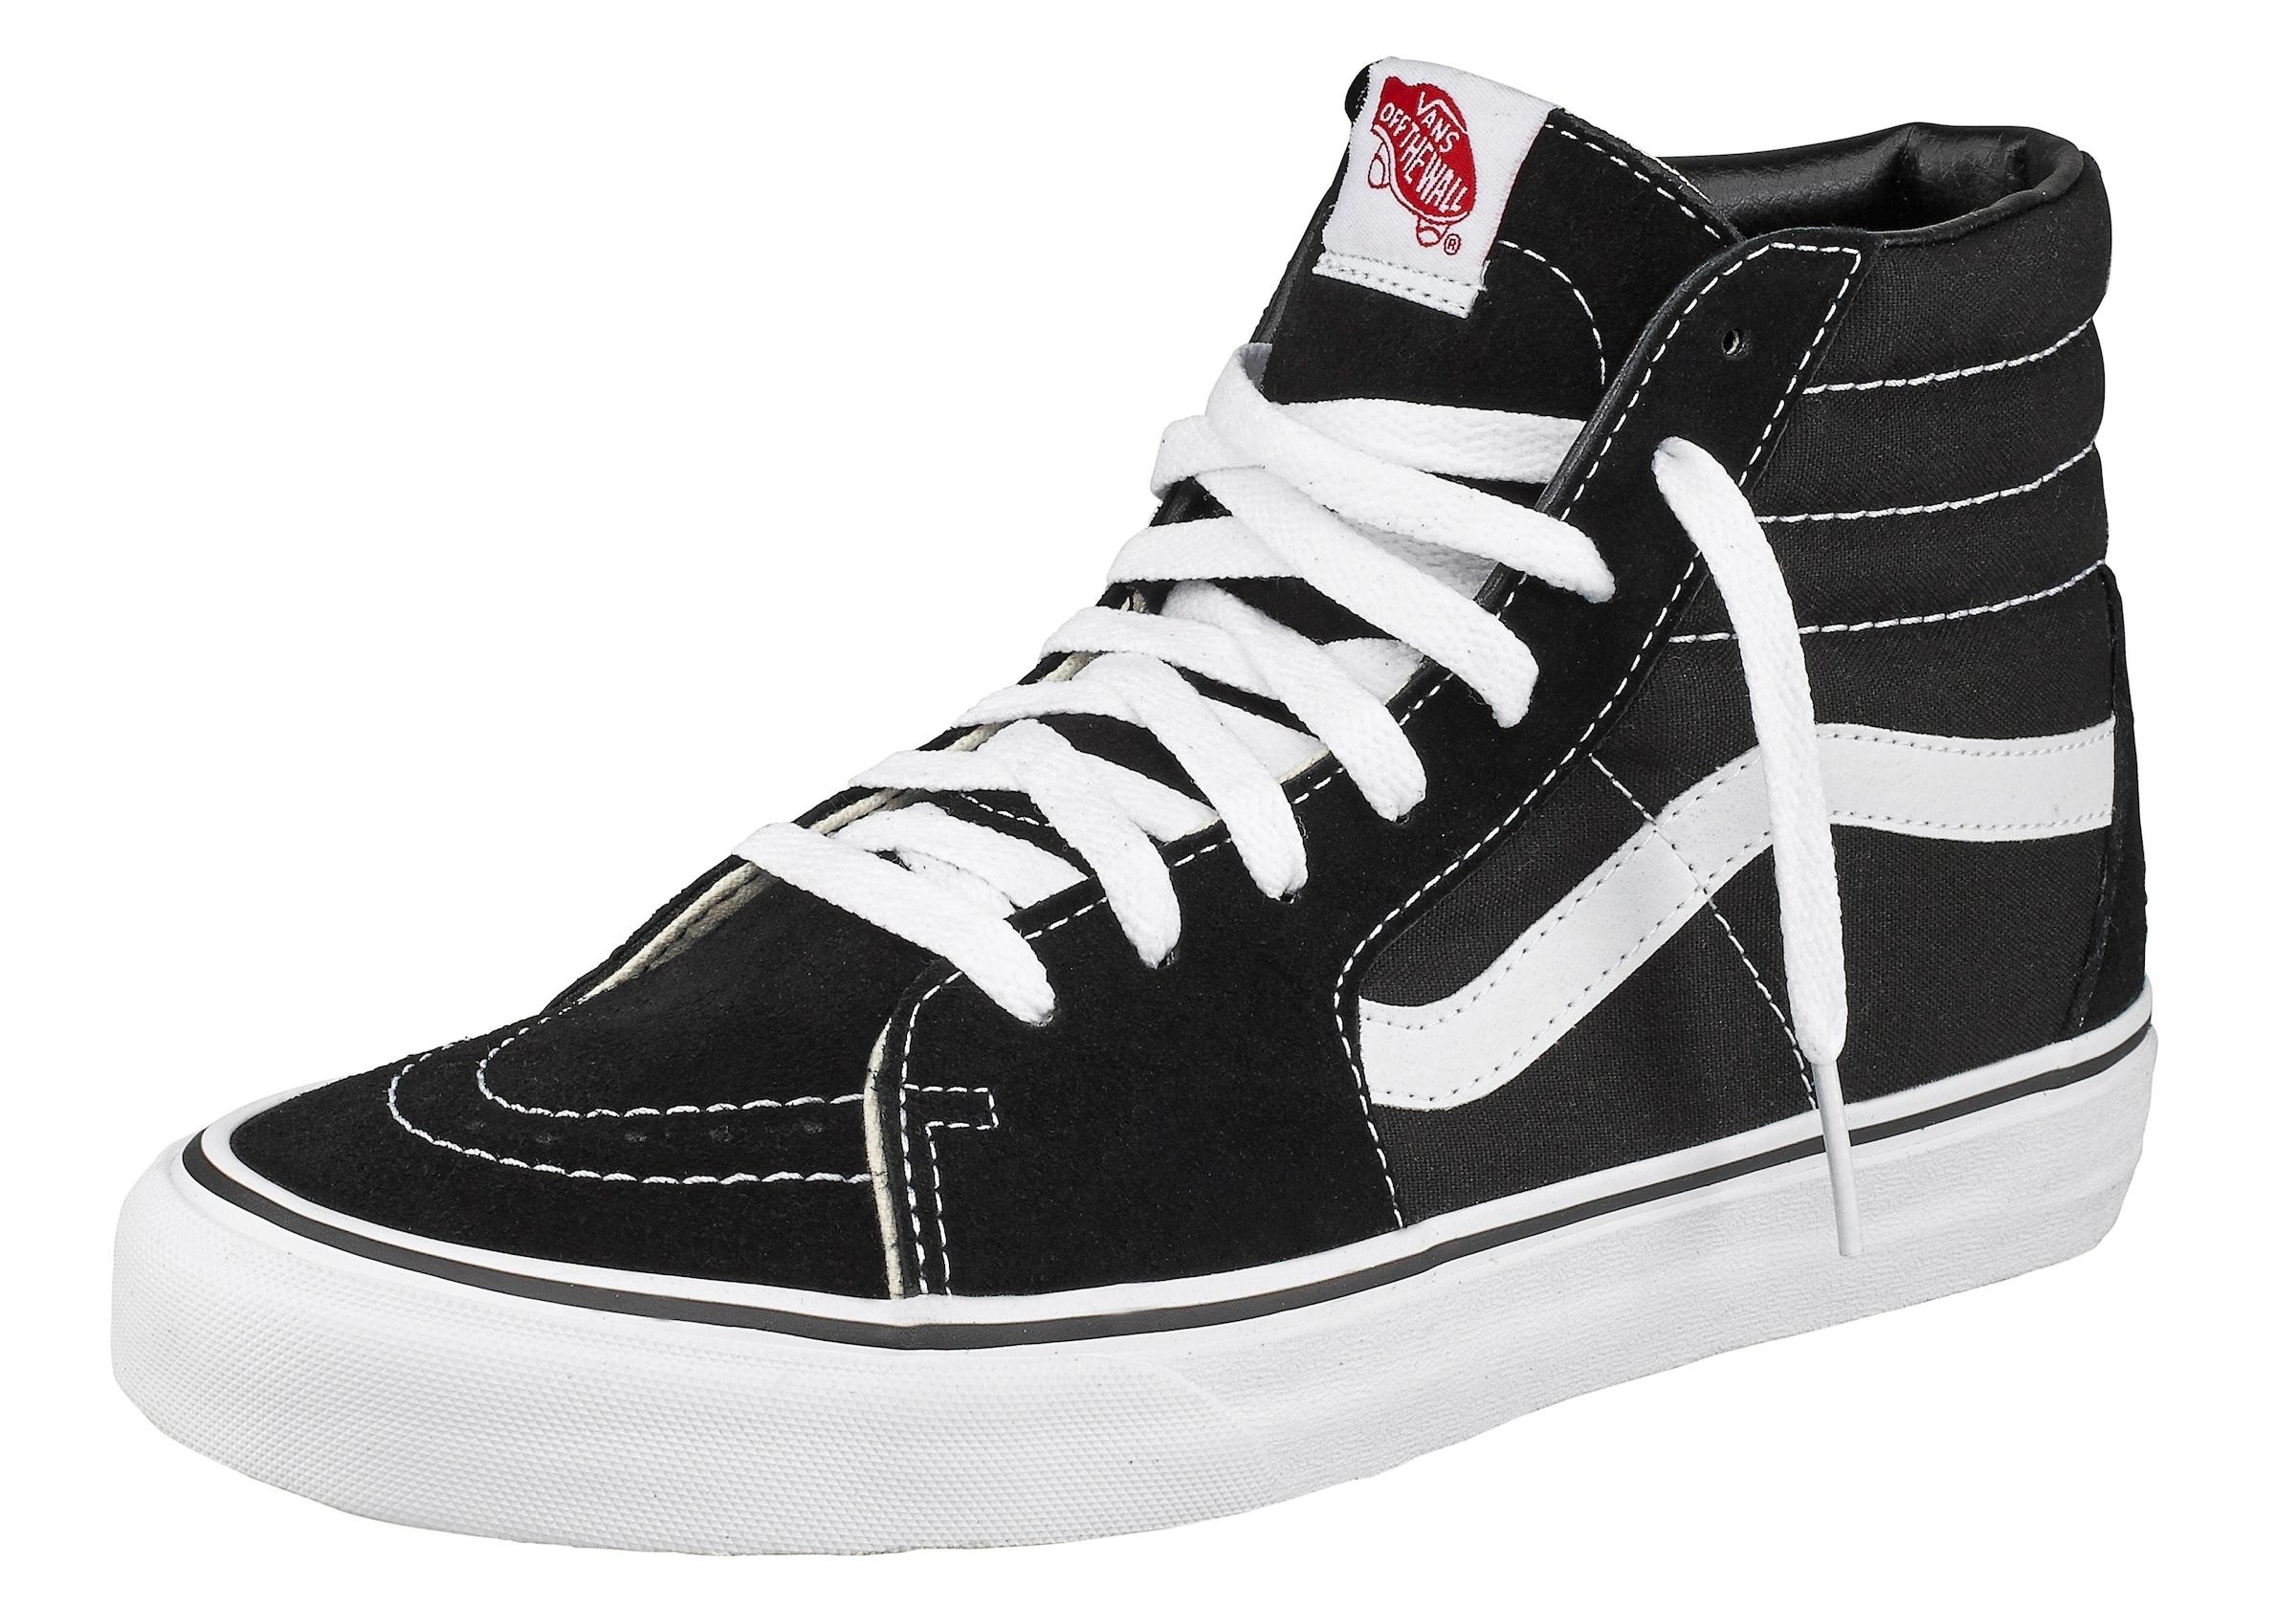 Vans Sneaker »SK8 Hi« günstig kaufen | BAUR